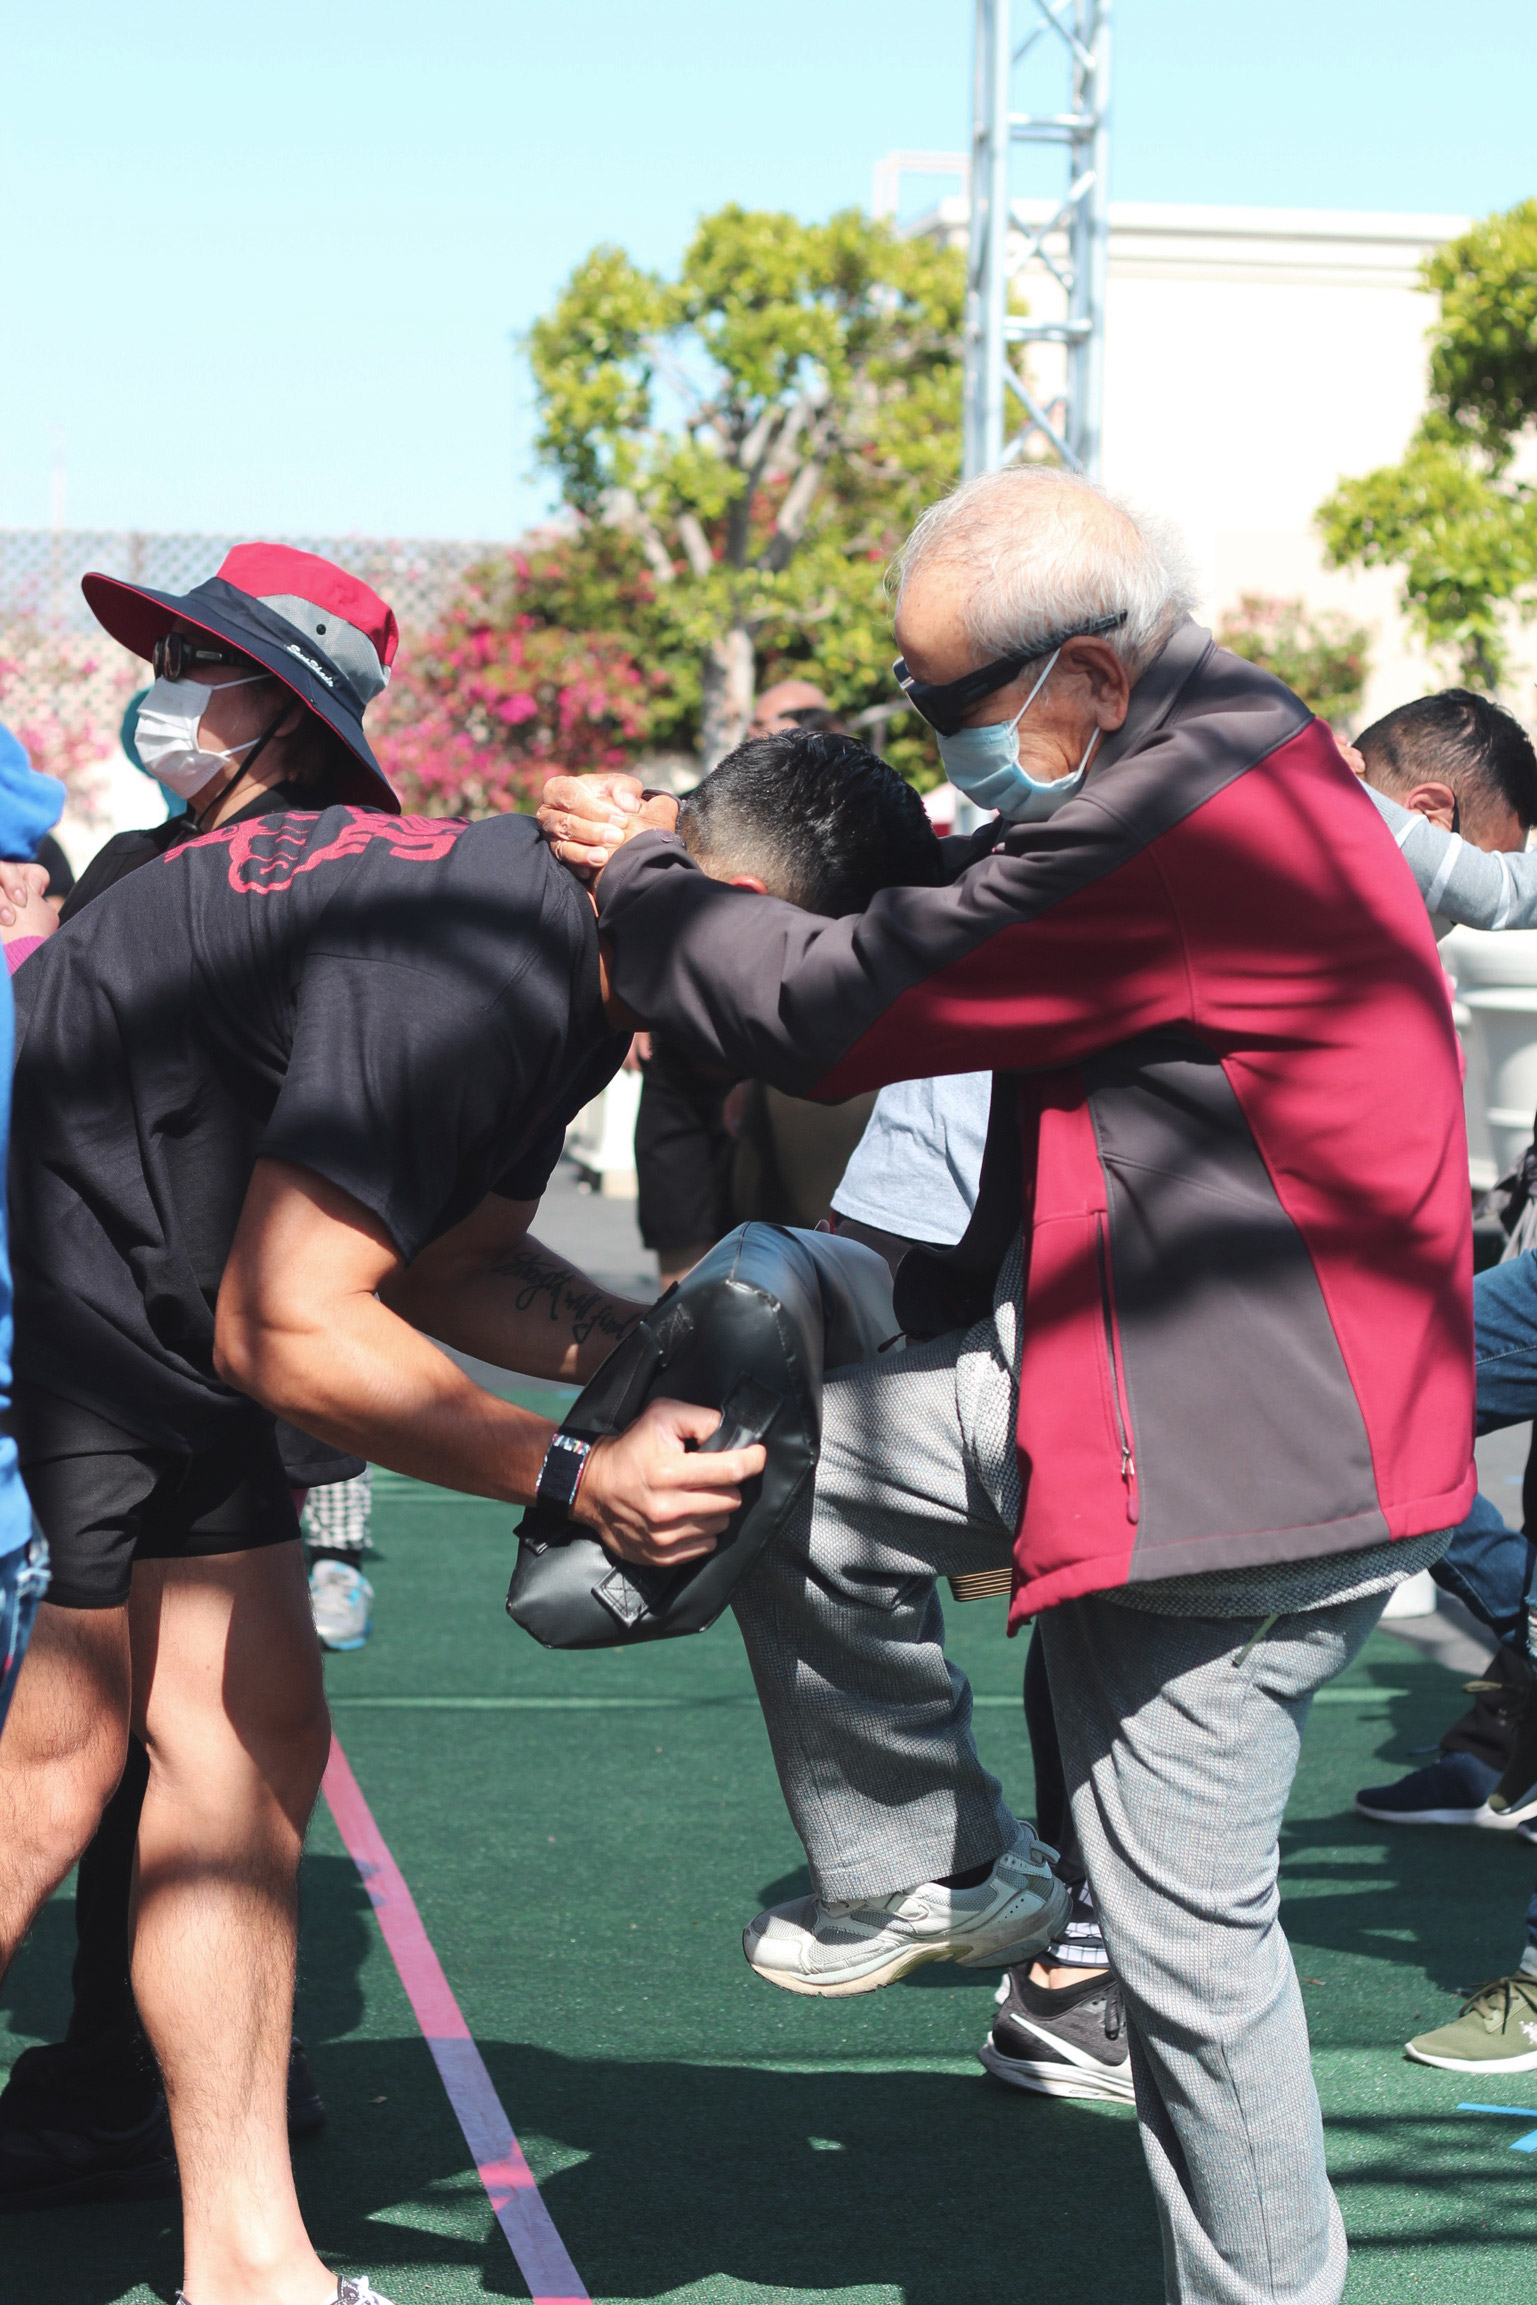 elderly man kneeing thai pads